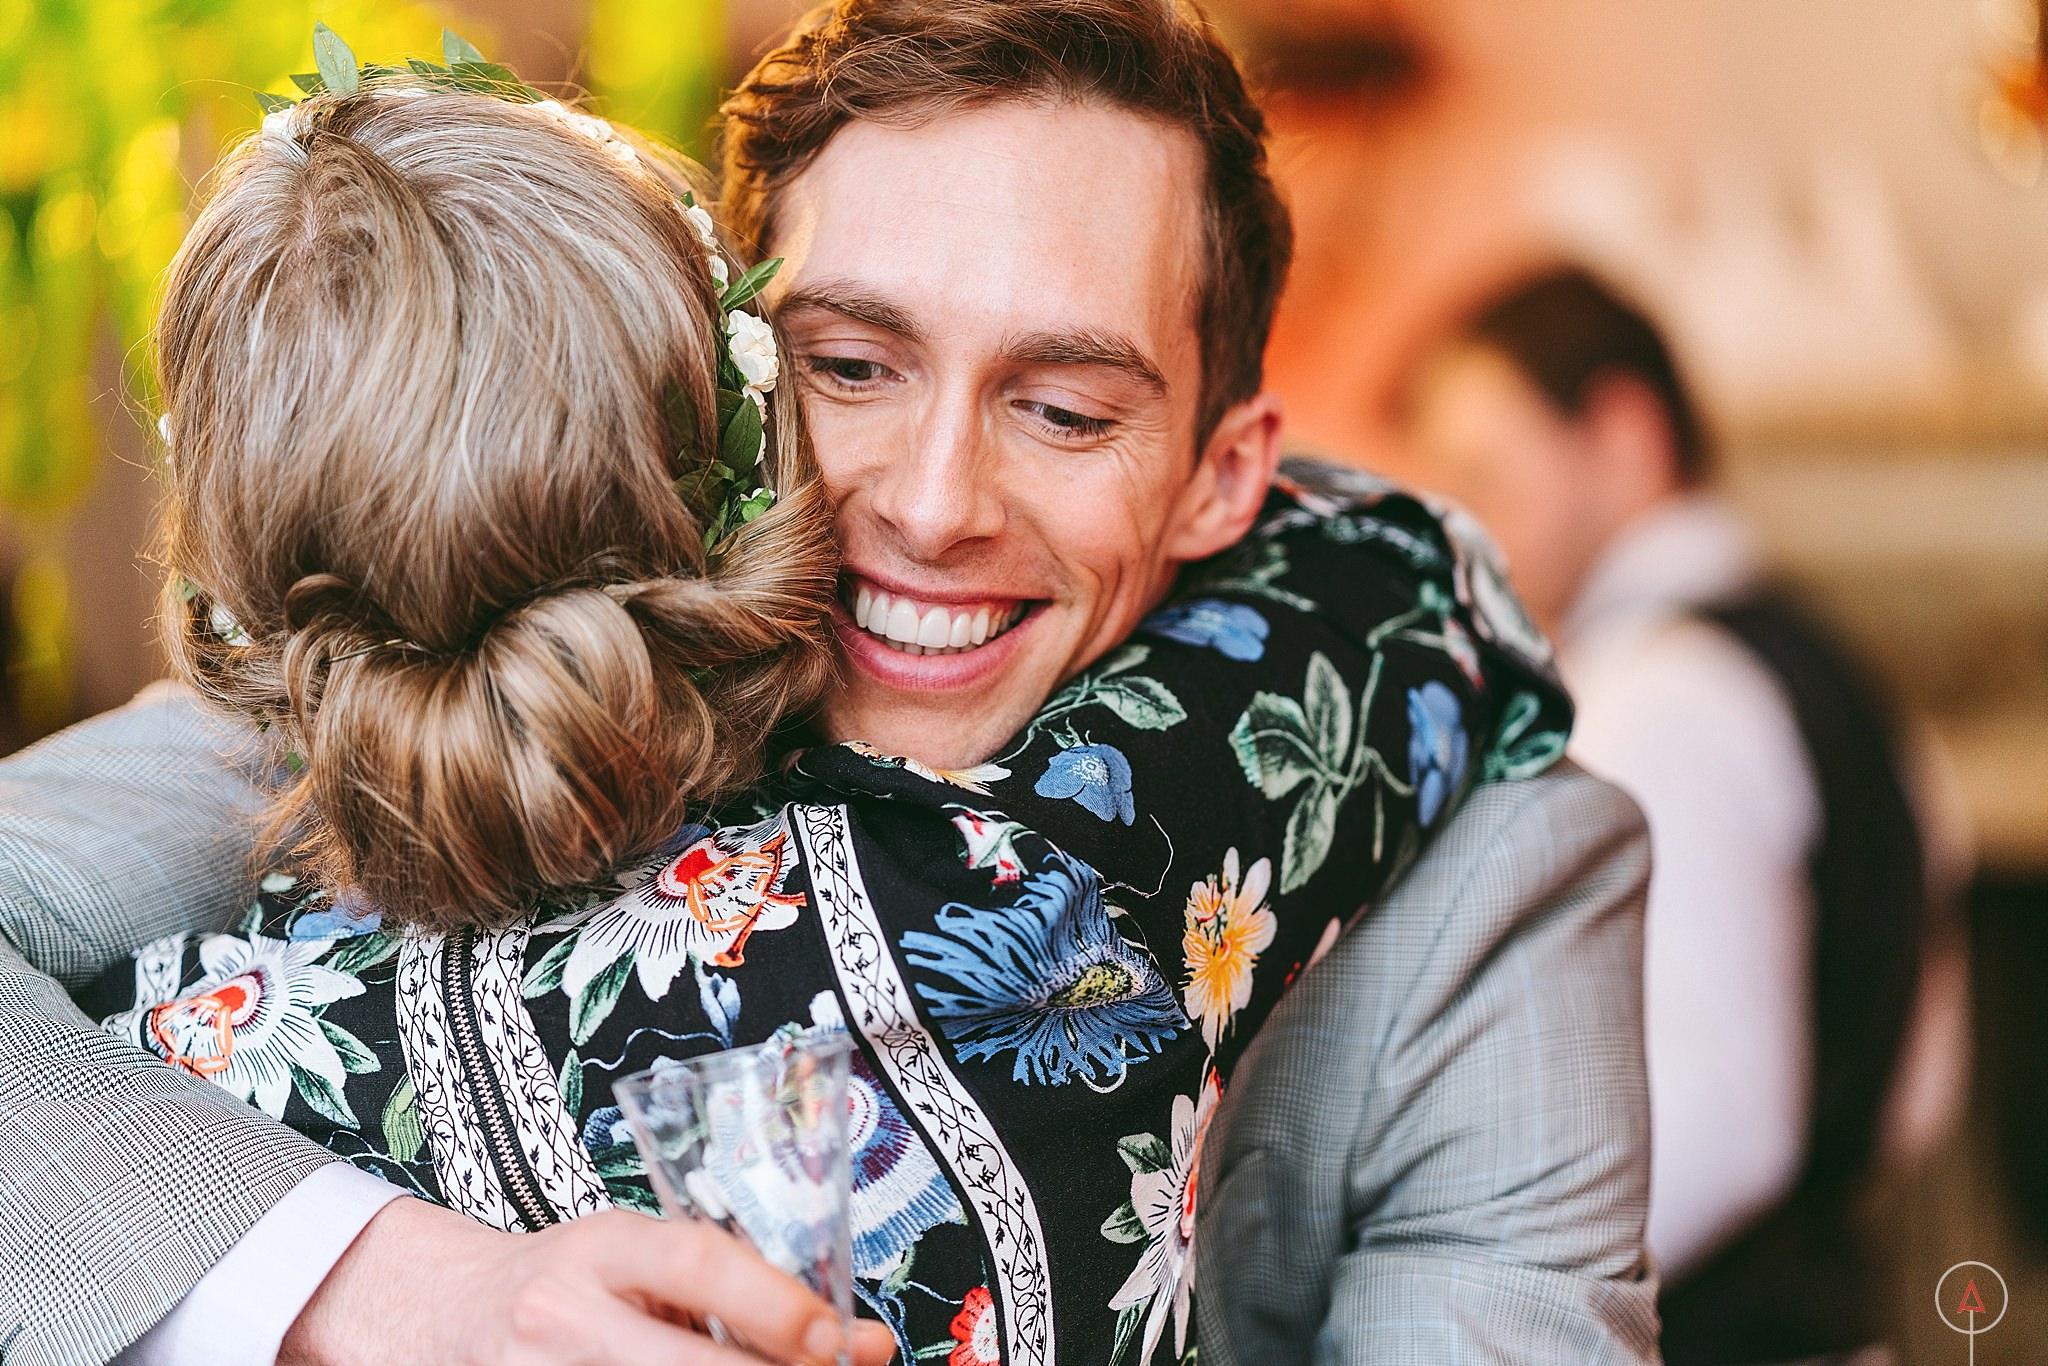 cardiff-wedding-photographer-aga-tomaszek_0268